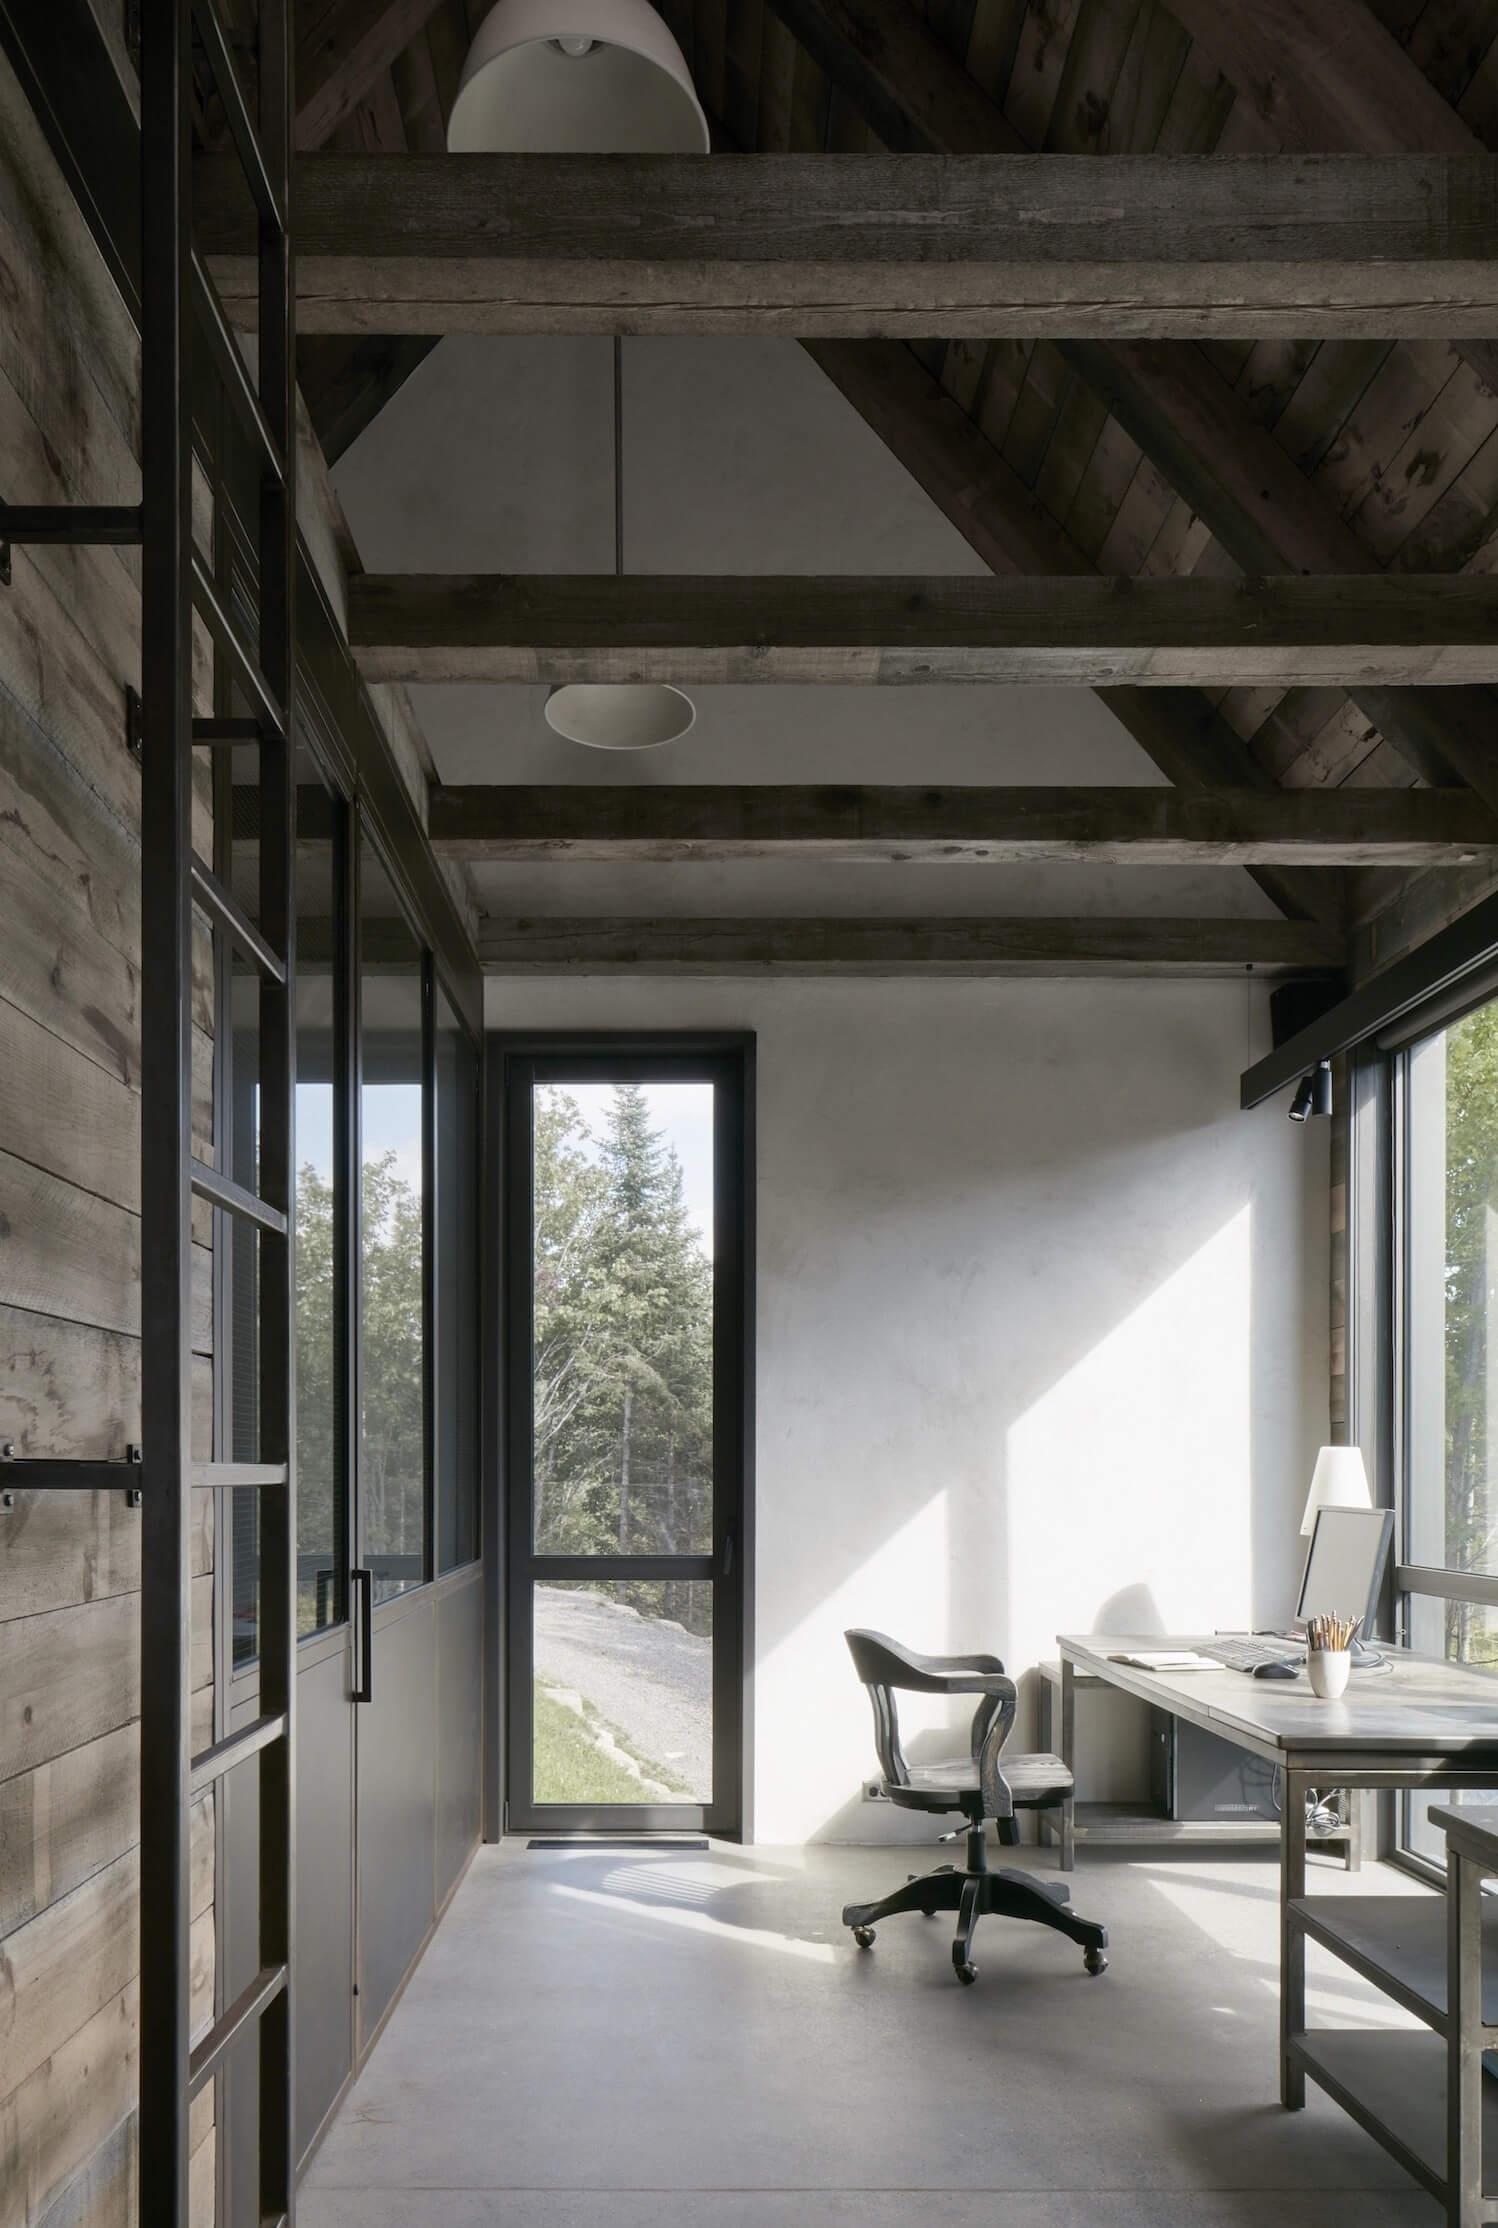 est living homes mg2 house alain carle architects james brittain 15 e1488256955468